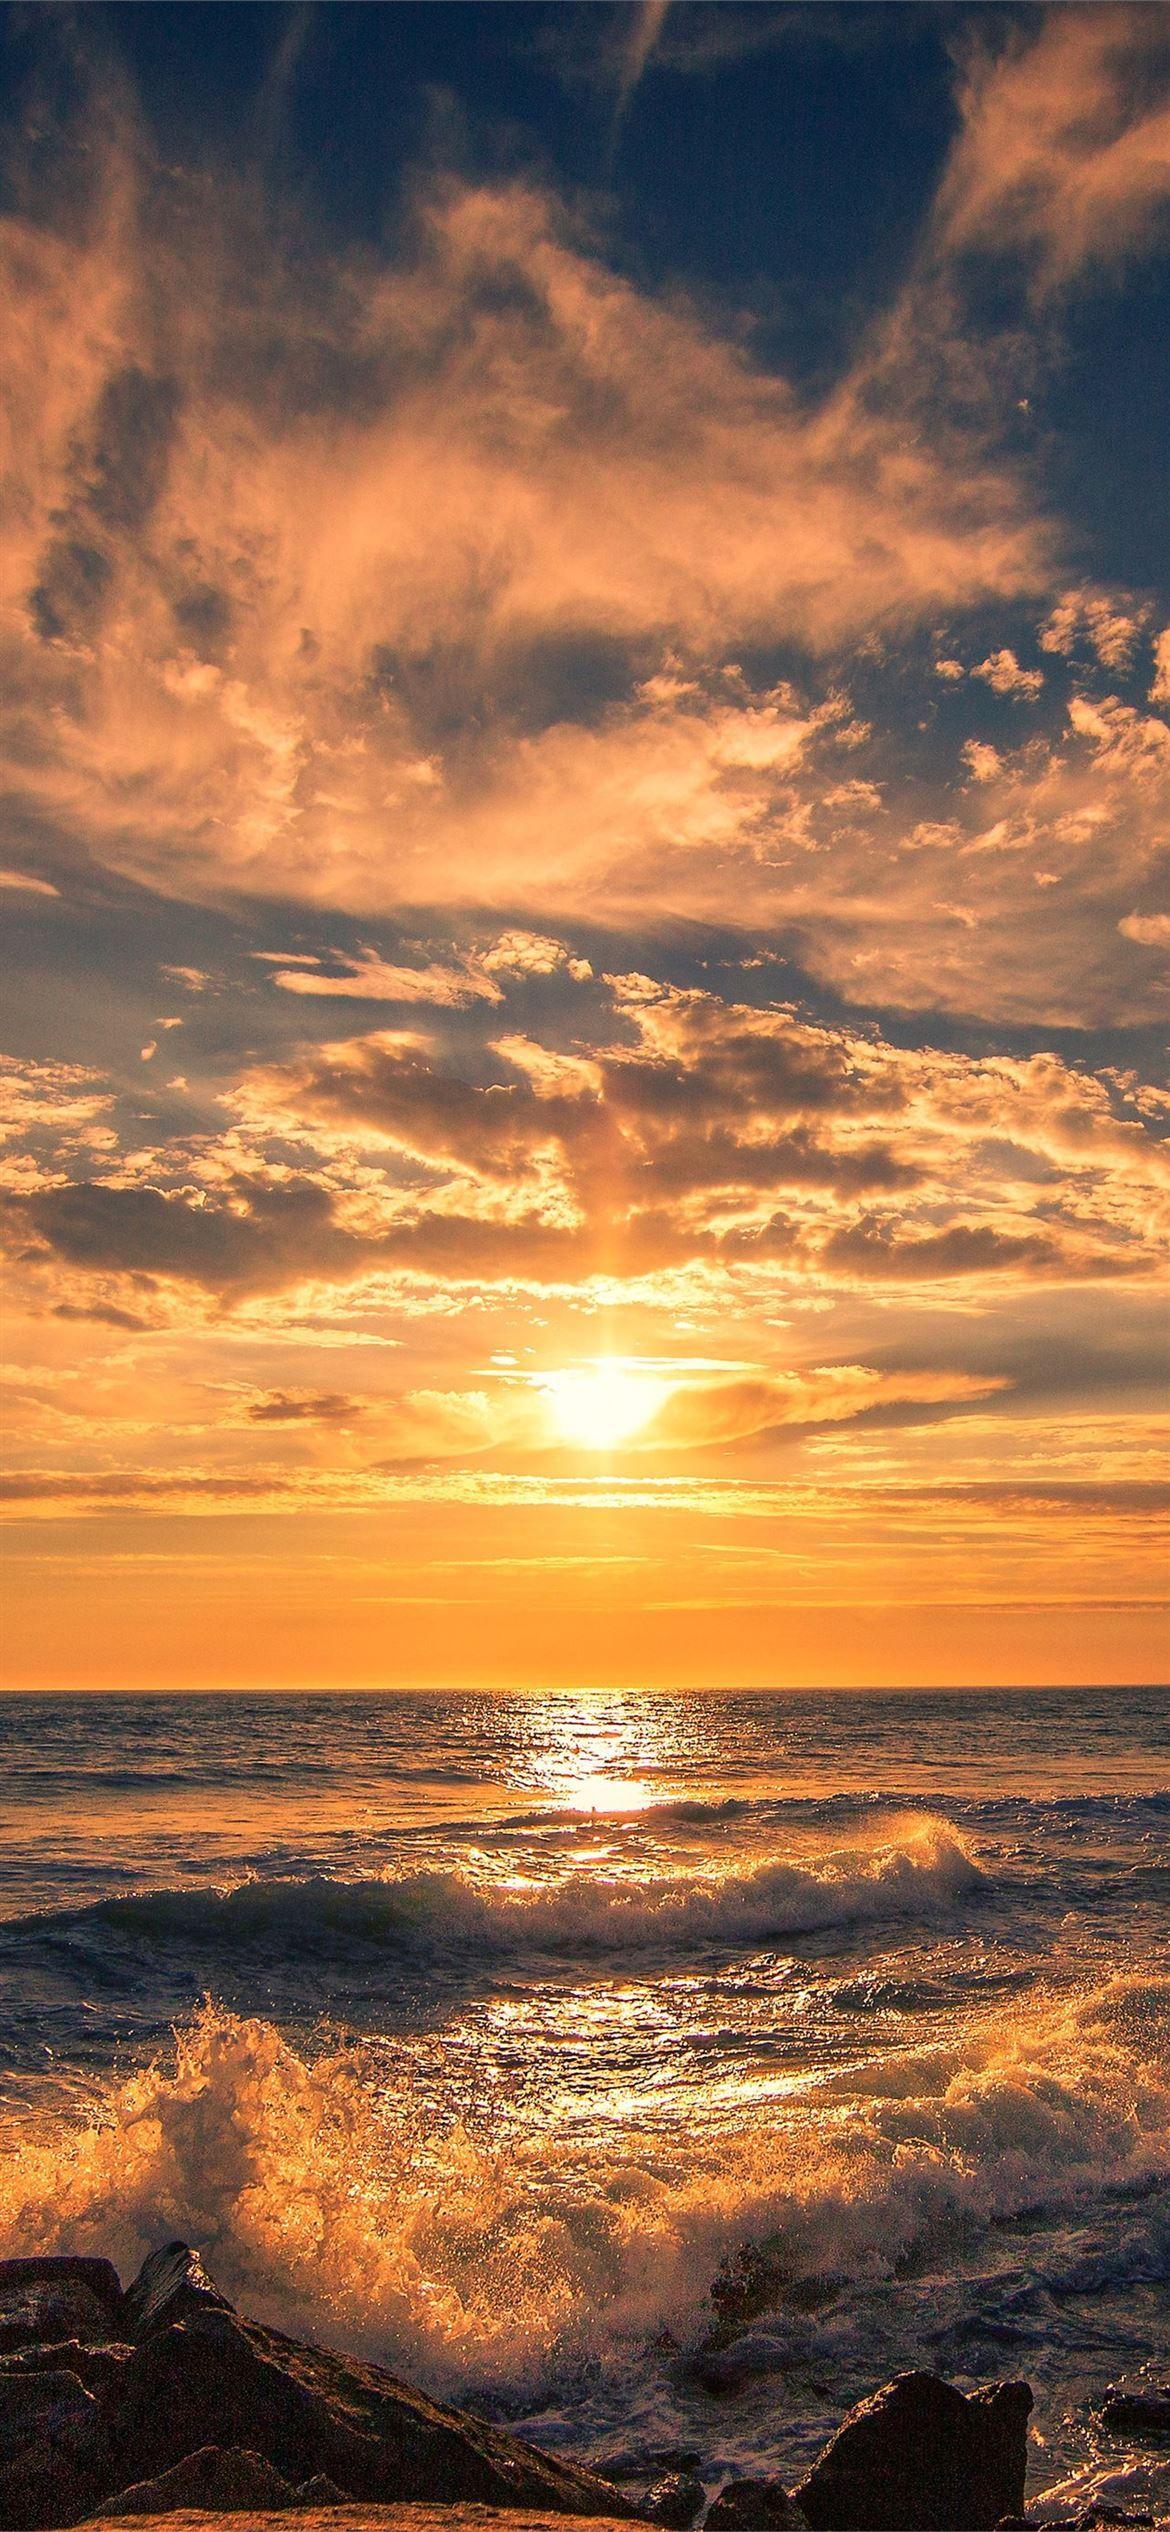 American Coastline Ocean Beach 5k Beach Ocean Nature 4k 5k Iphone Wallpaper Landscape Surfing Wallpaper Hd Phone Wallpapers